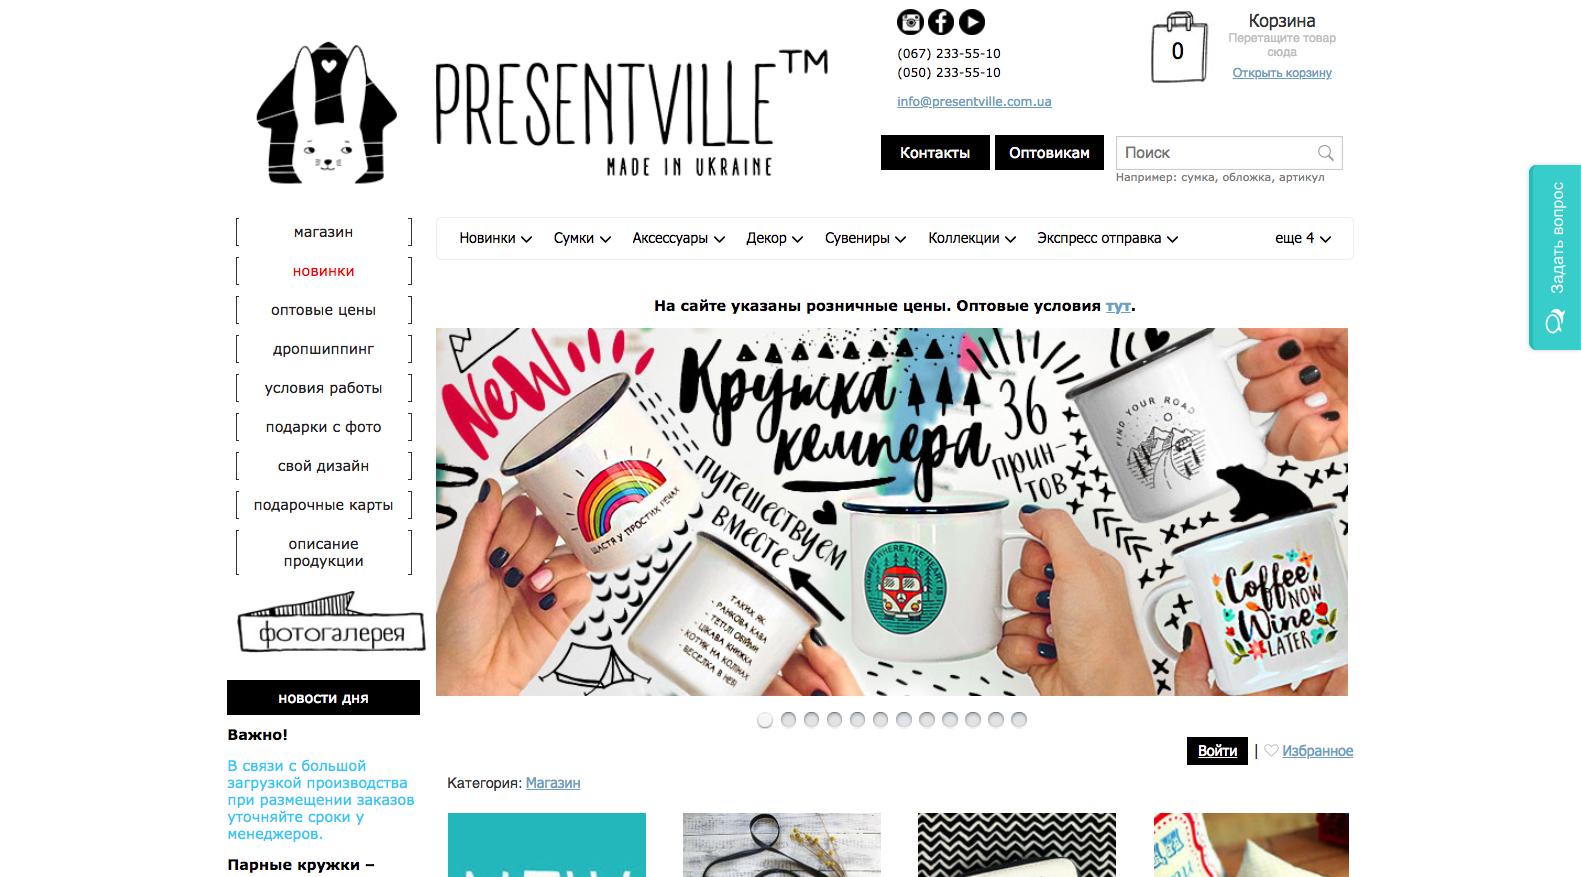 Presentville